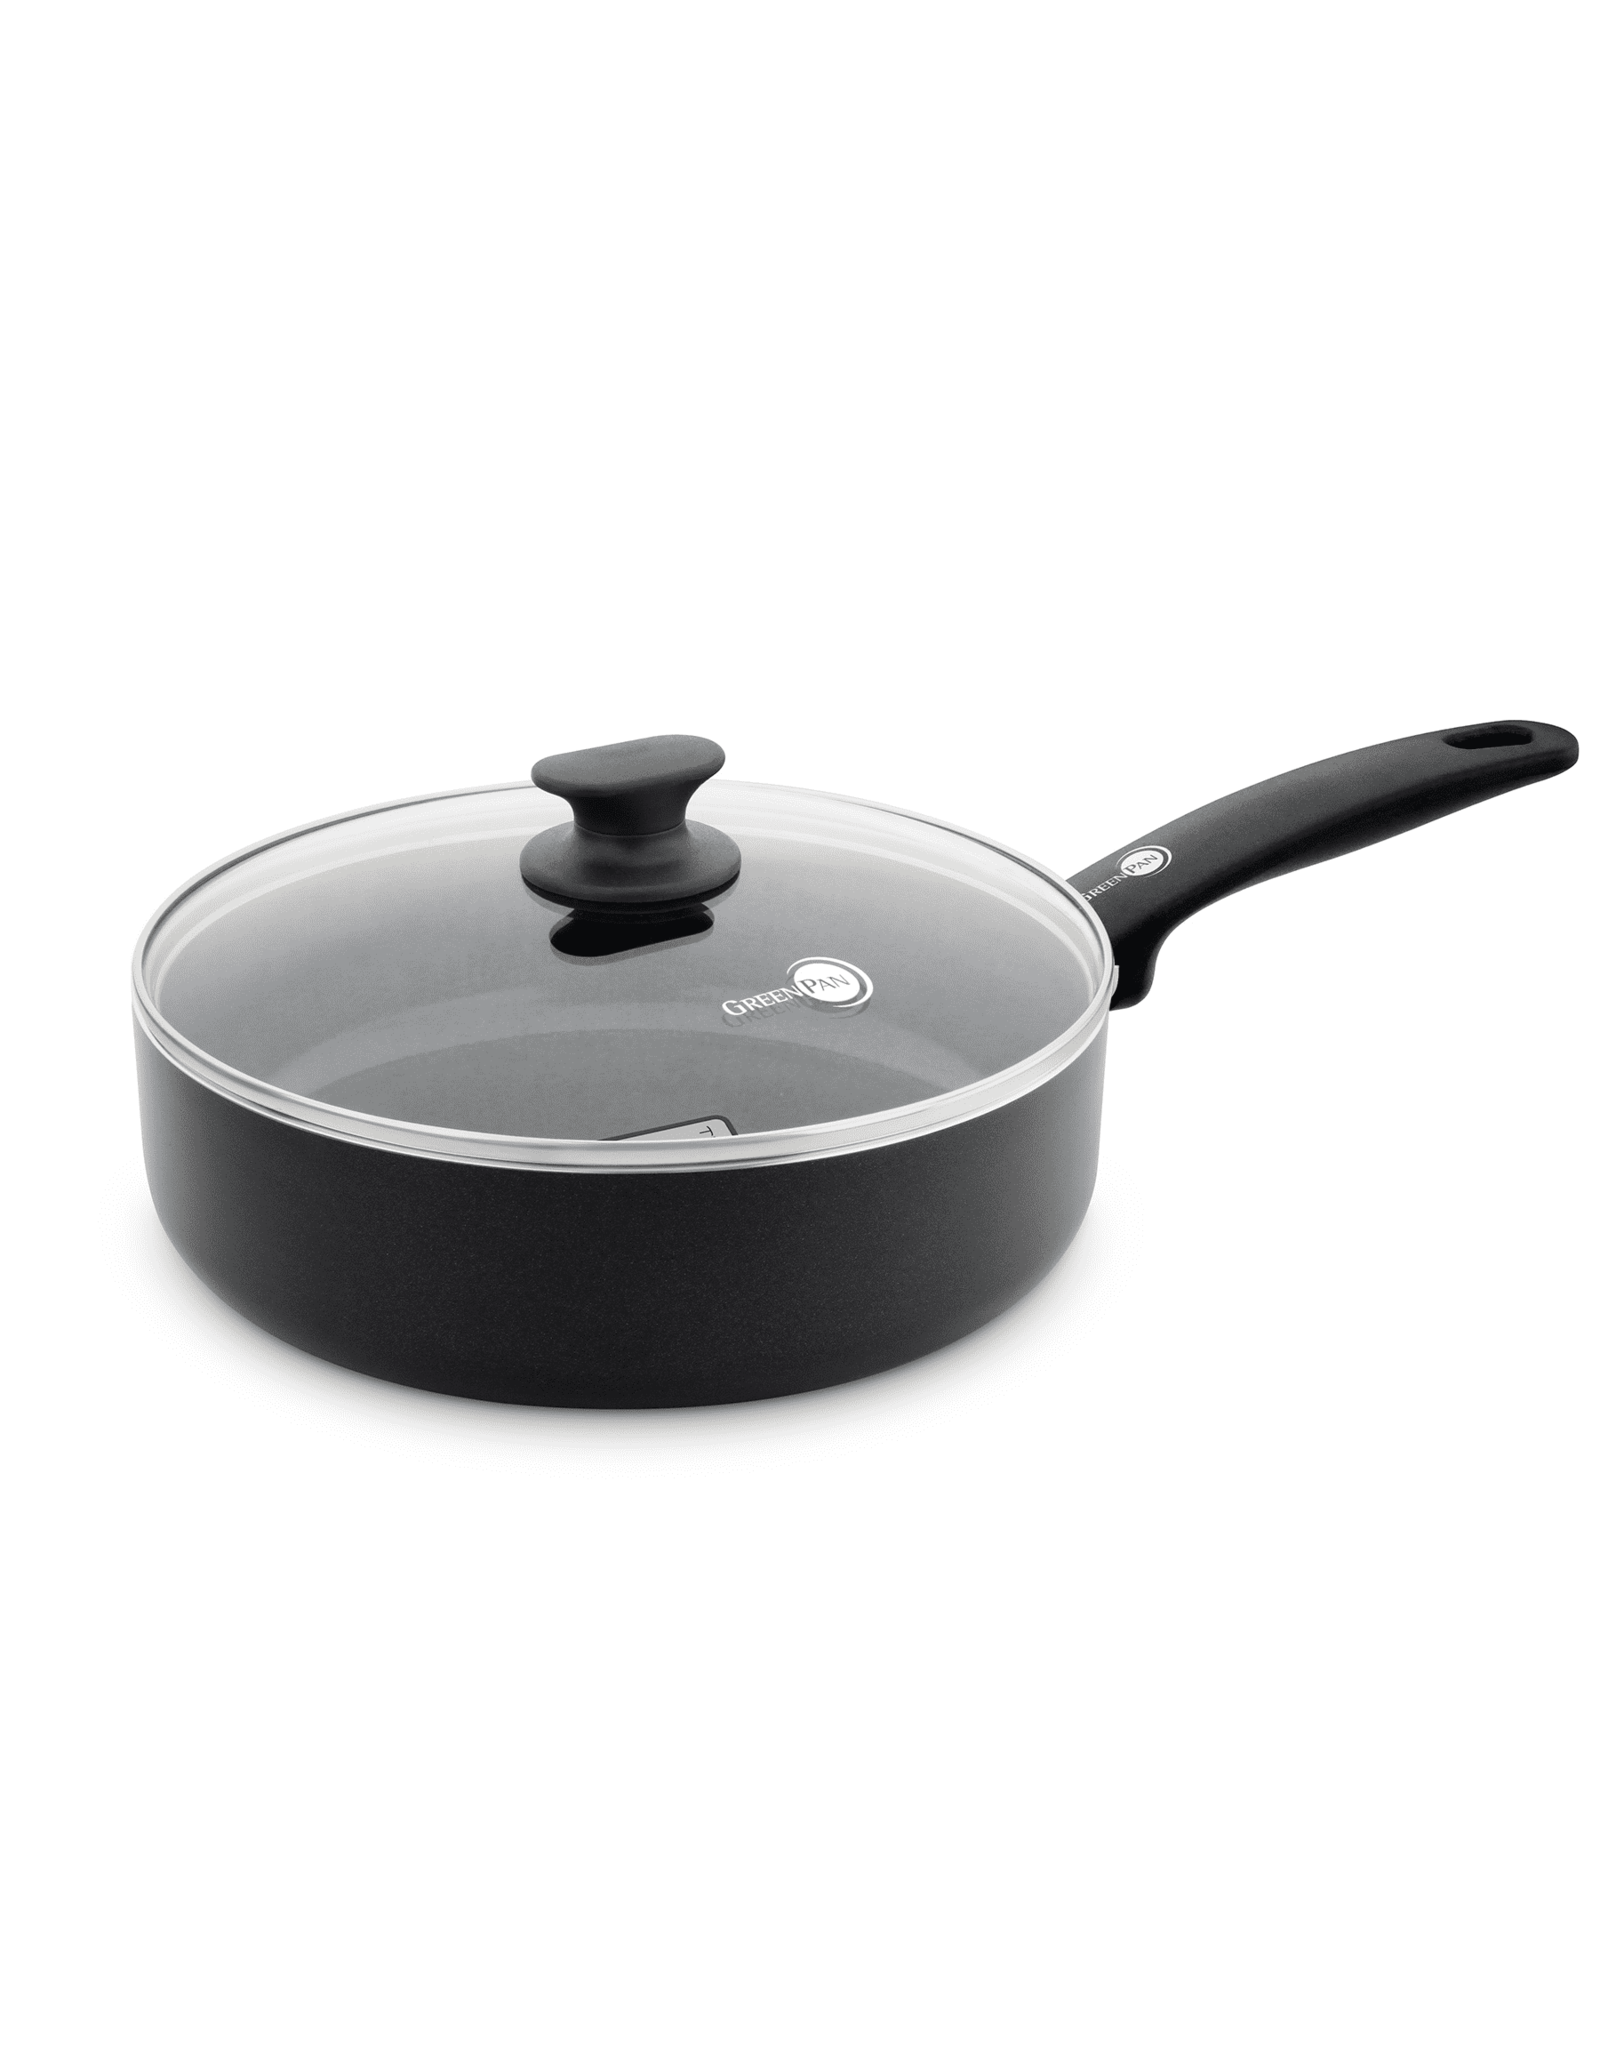 GREEN PAN Hapjespan ZWART SAUTEUSE 24 CM CAMBRIDGE INFINITY